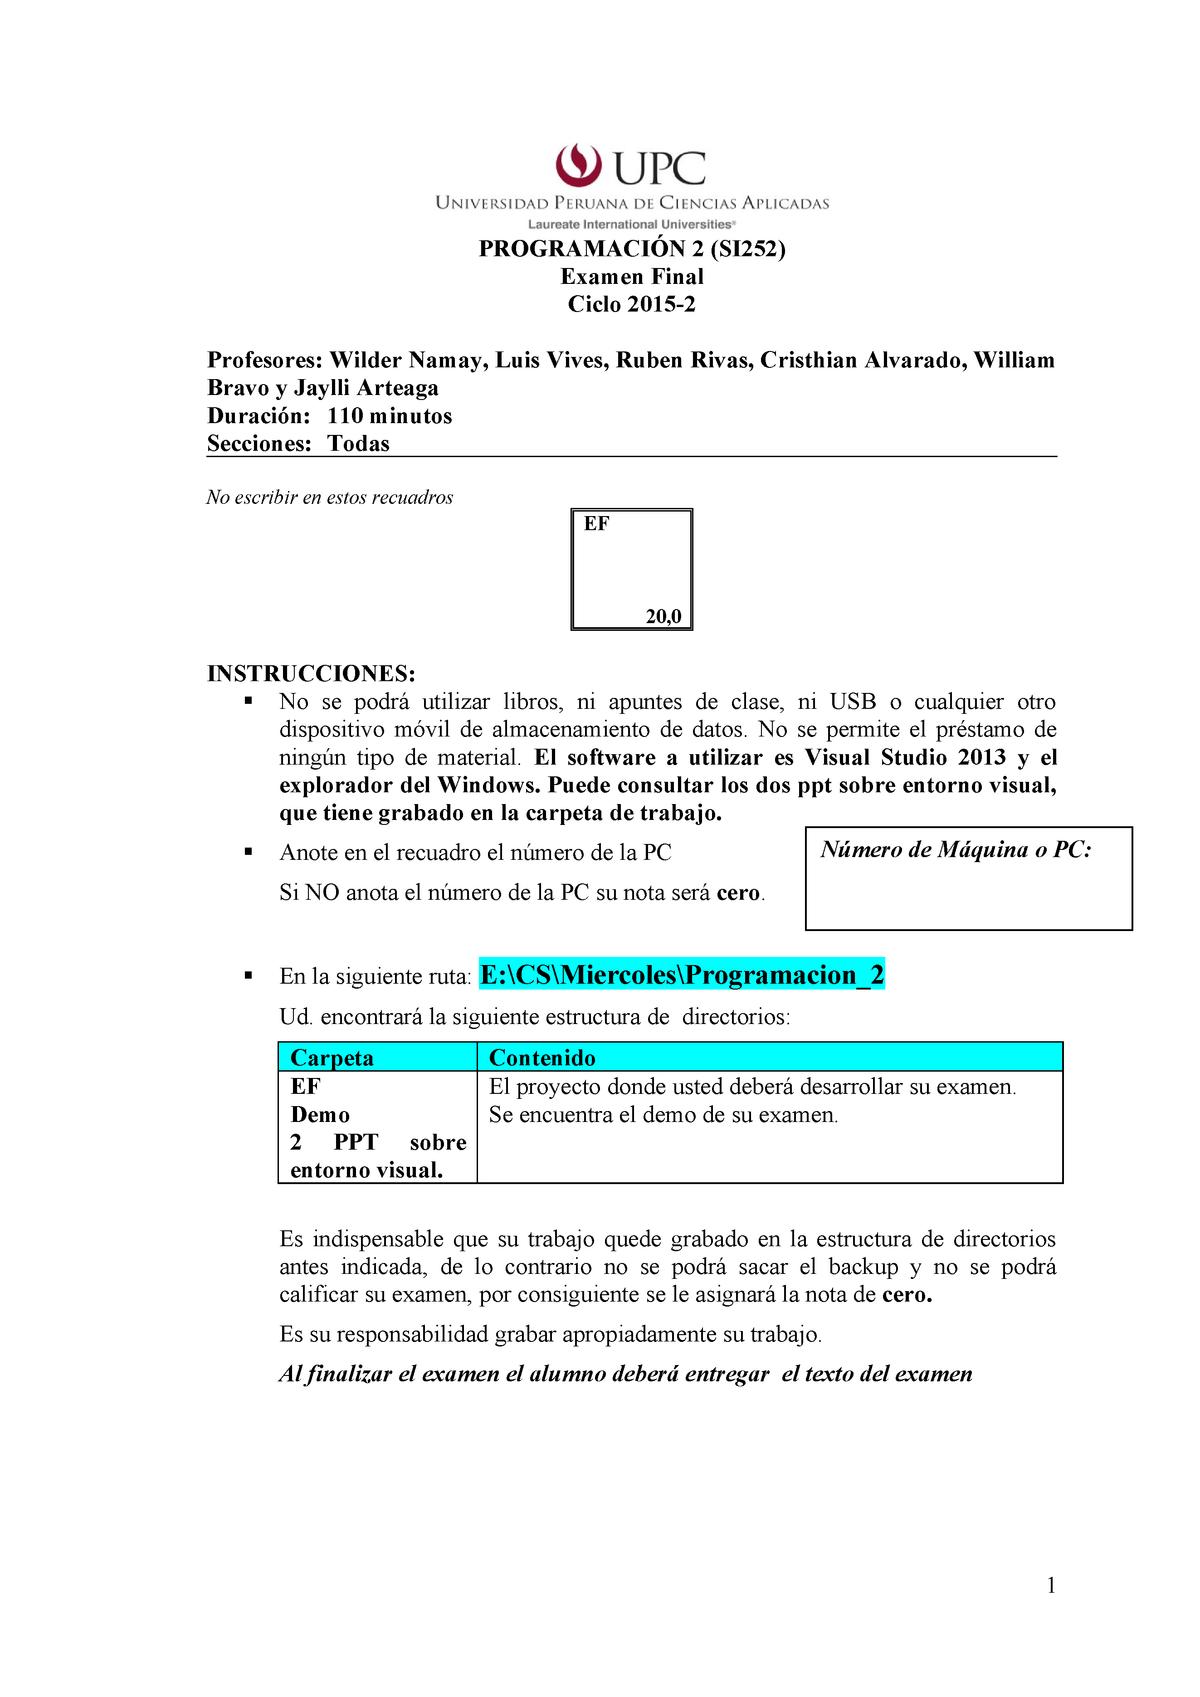 Examen 2015 Preguntas Programacion 2 Cc67 Upc Studocu